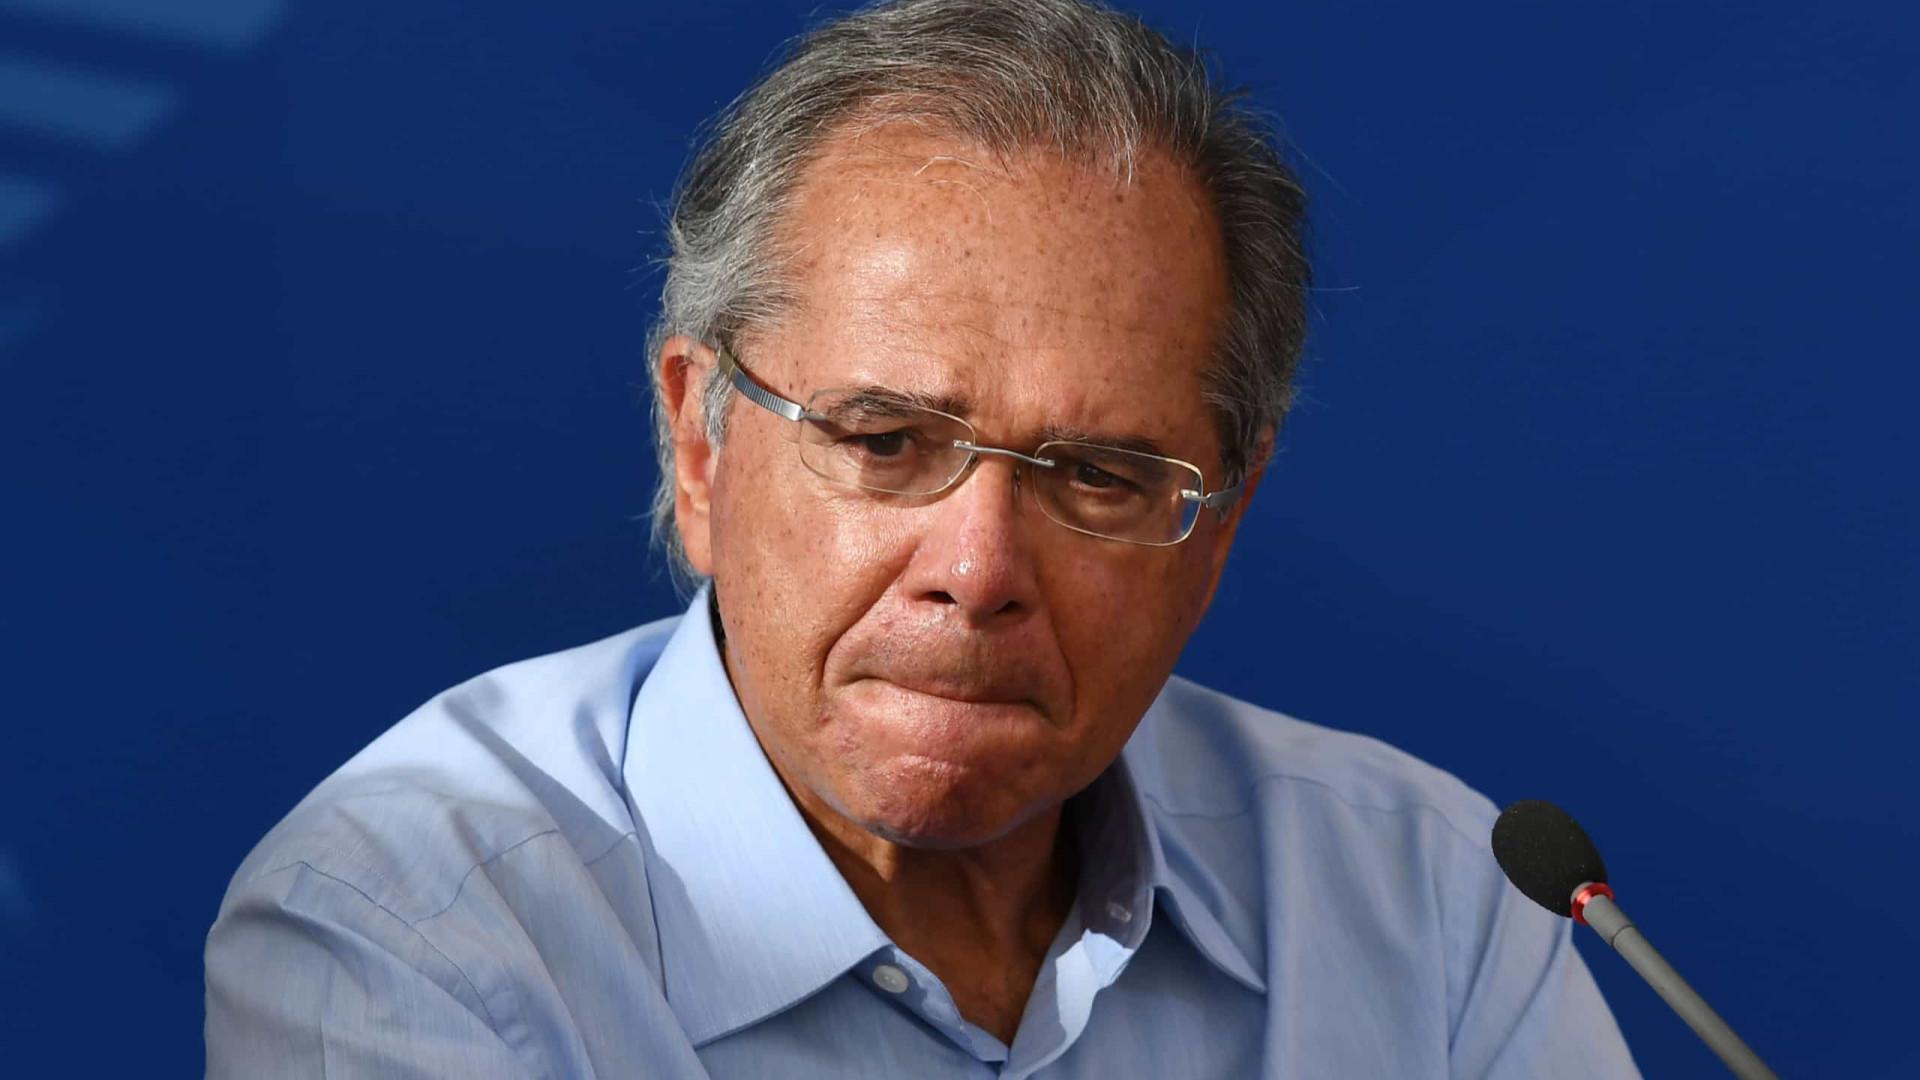 Marco Aurélio nega pedido de liminar para afastamento de Guedes